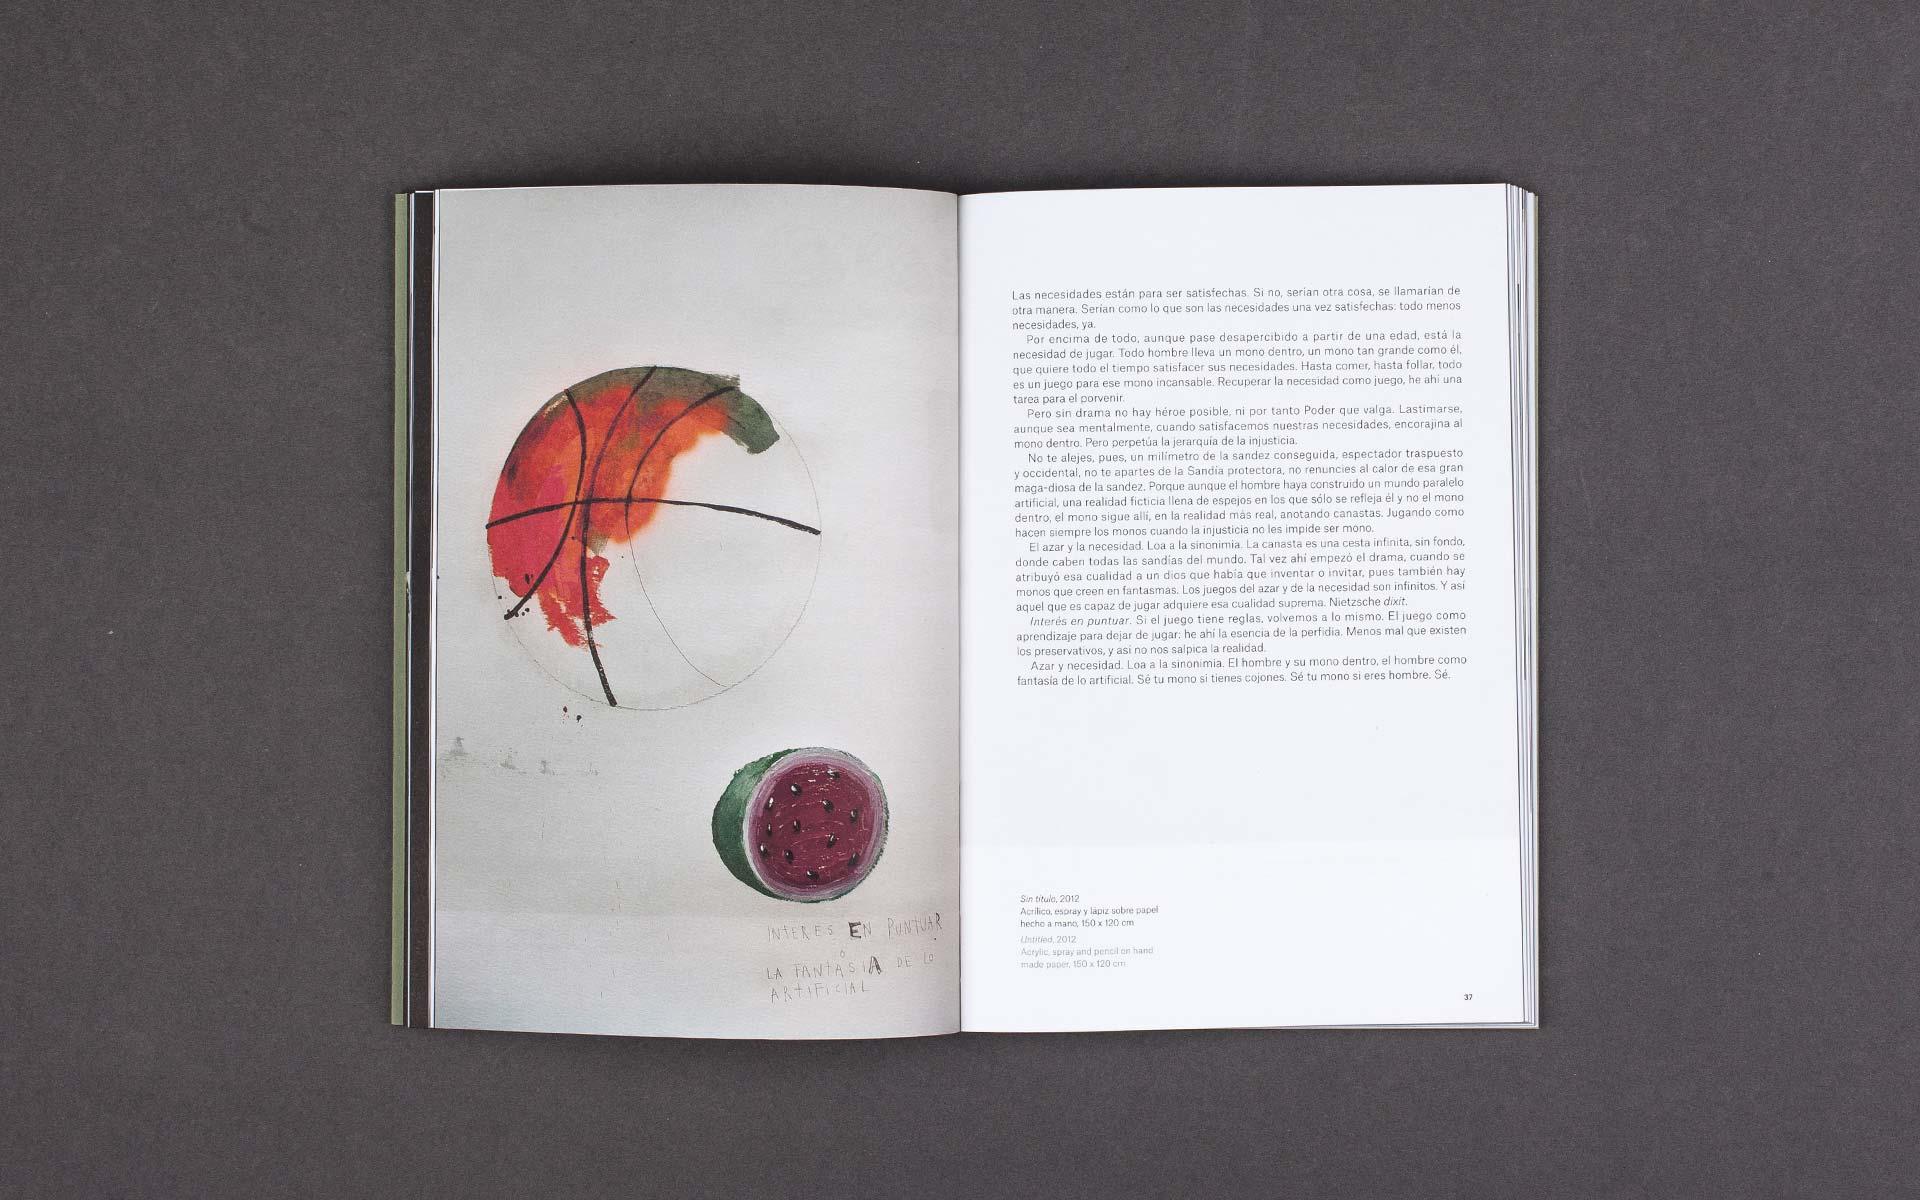 diseño-grafico-mallorca-hastalastantas-MarceloViquez11